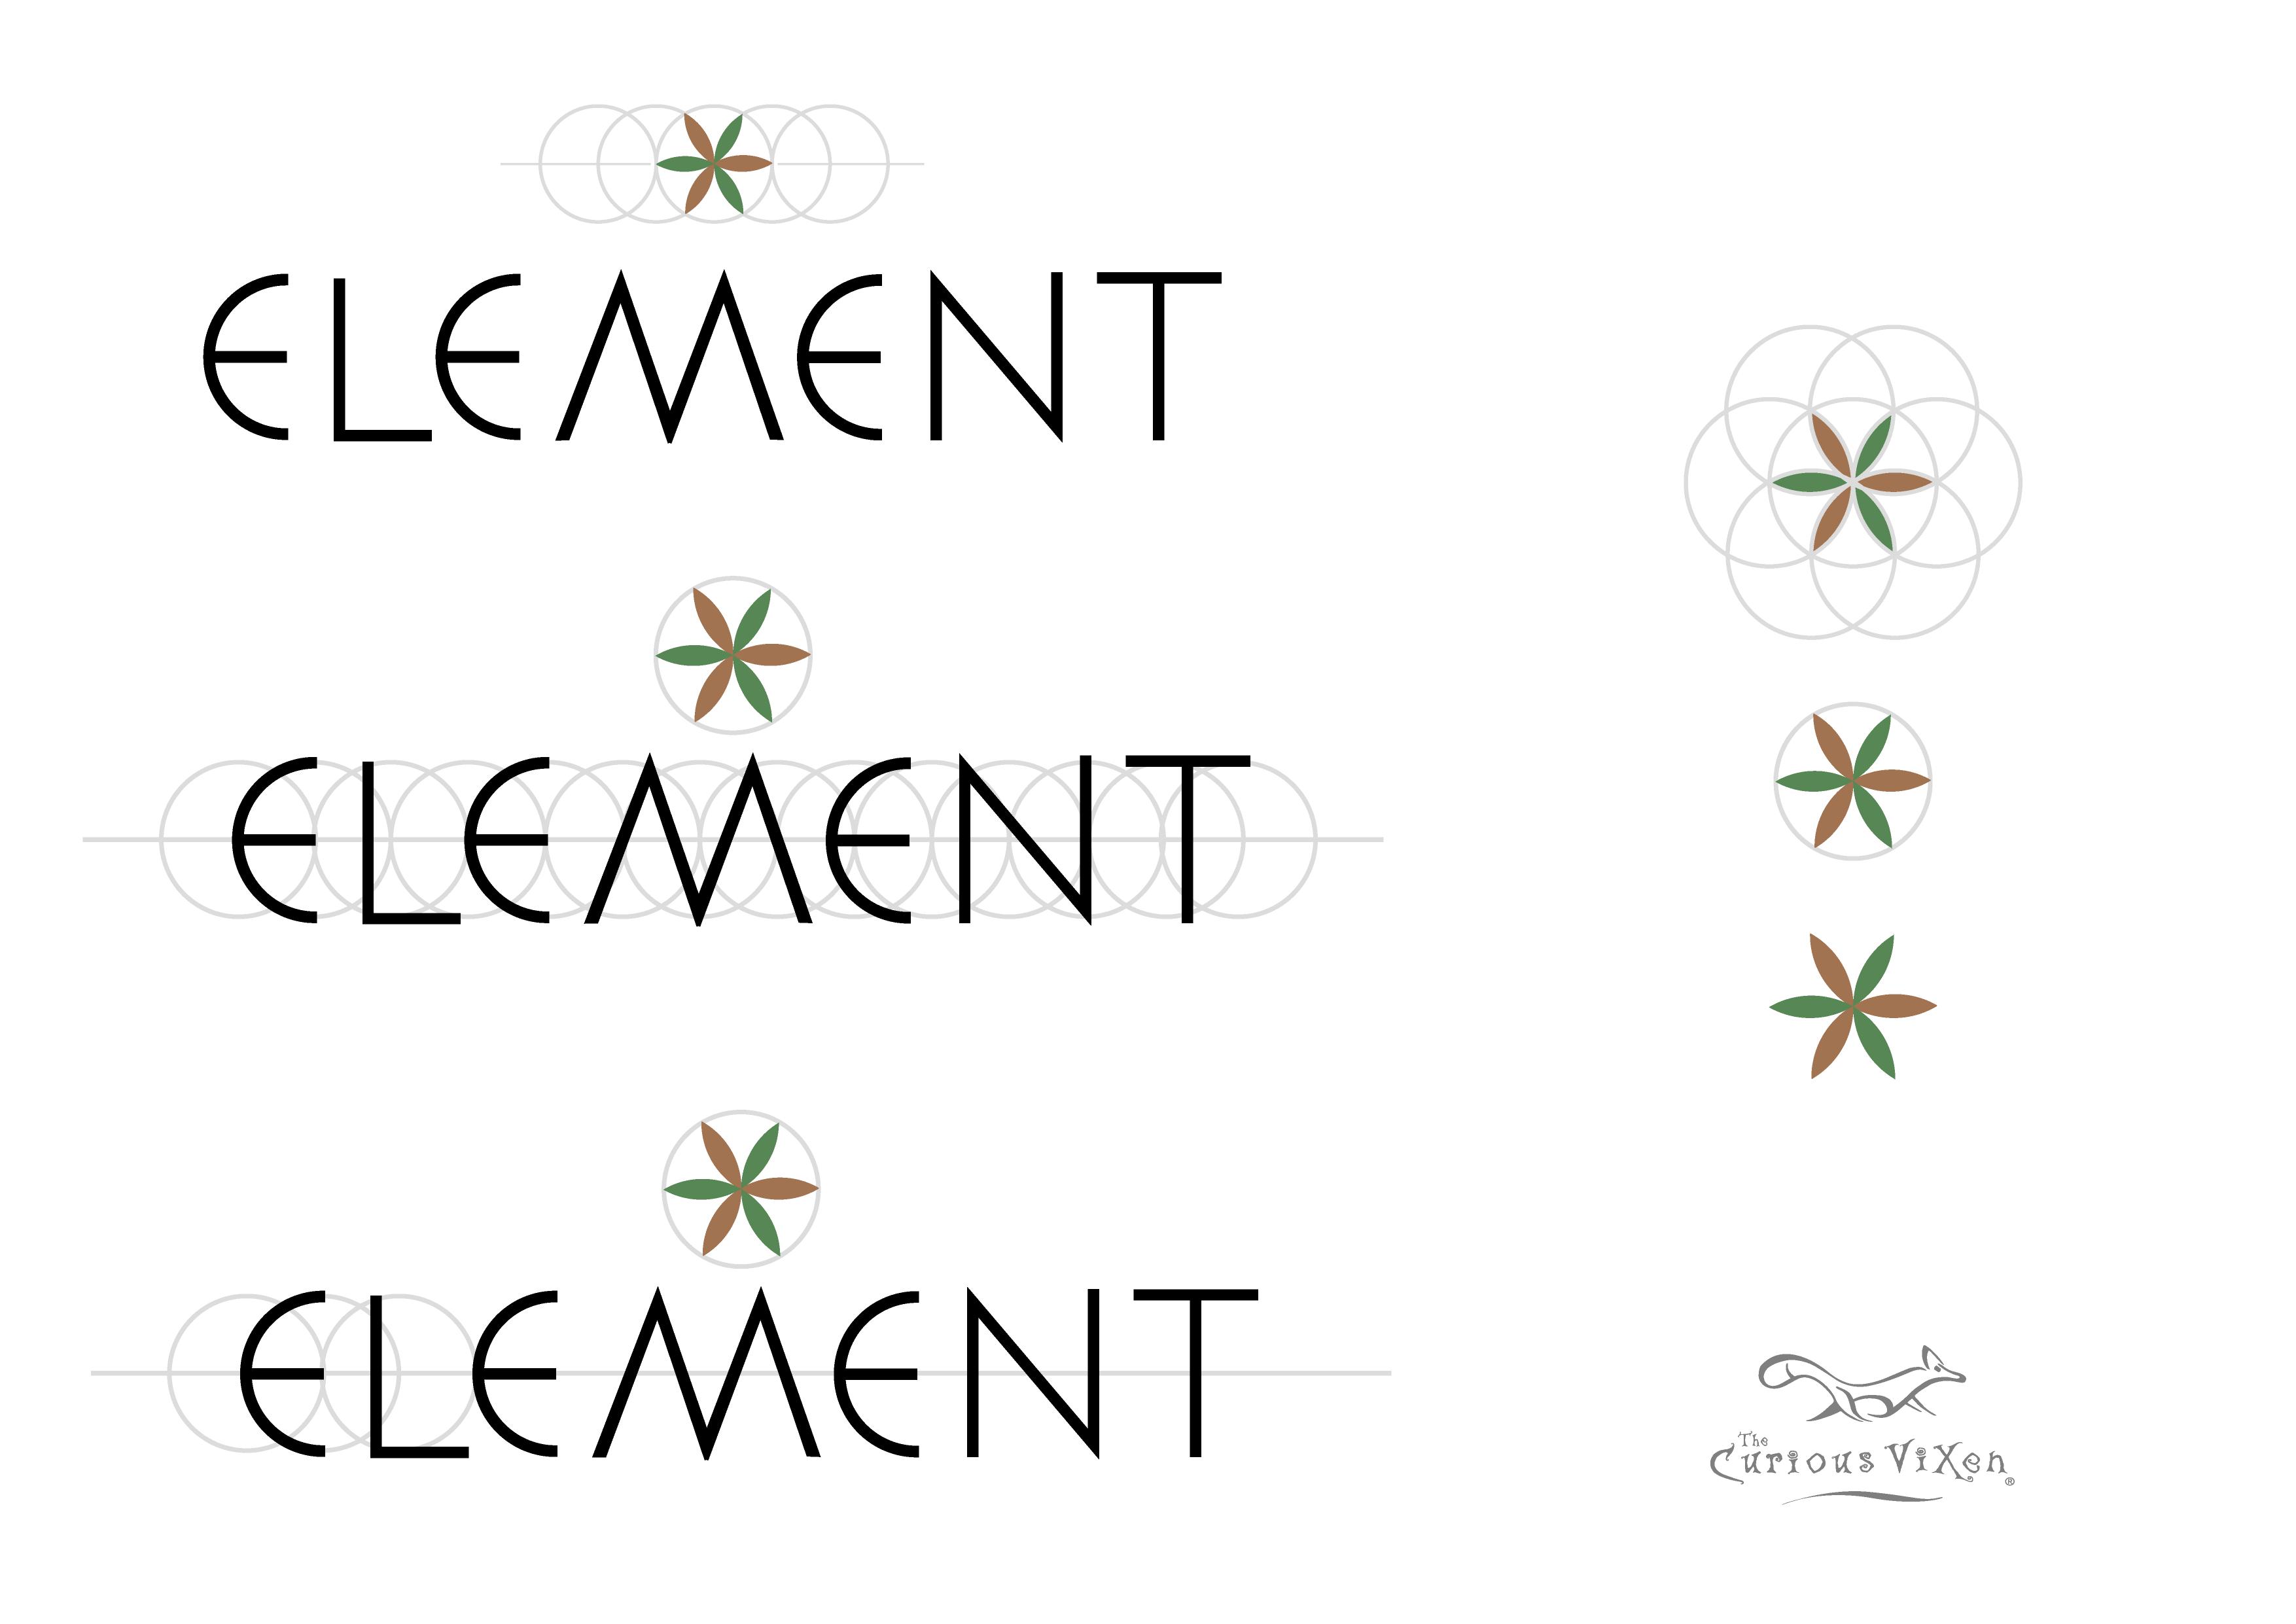 3. Digitally drawn lettering